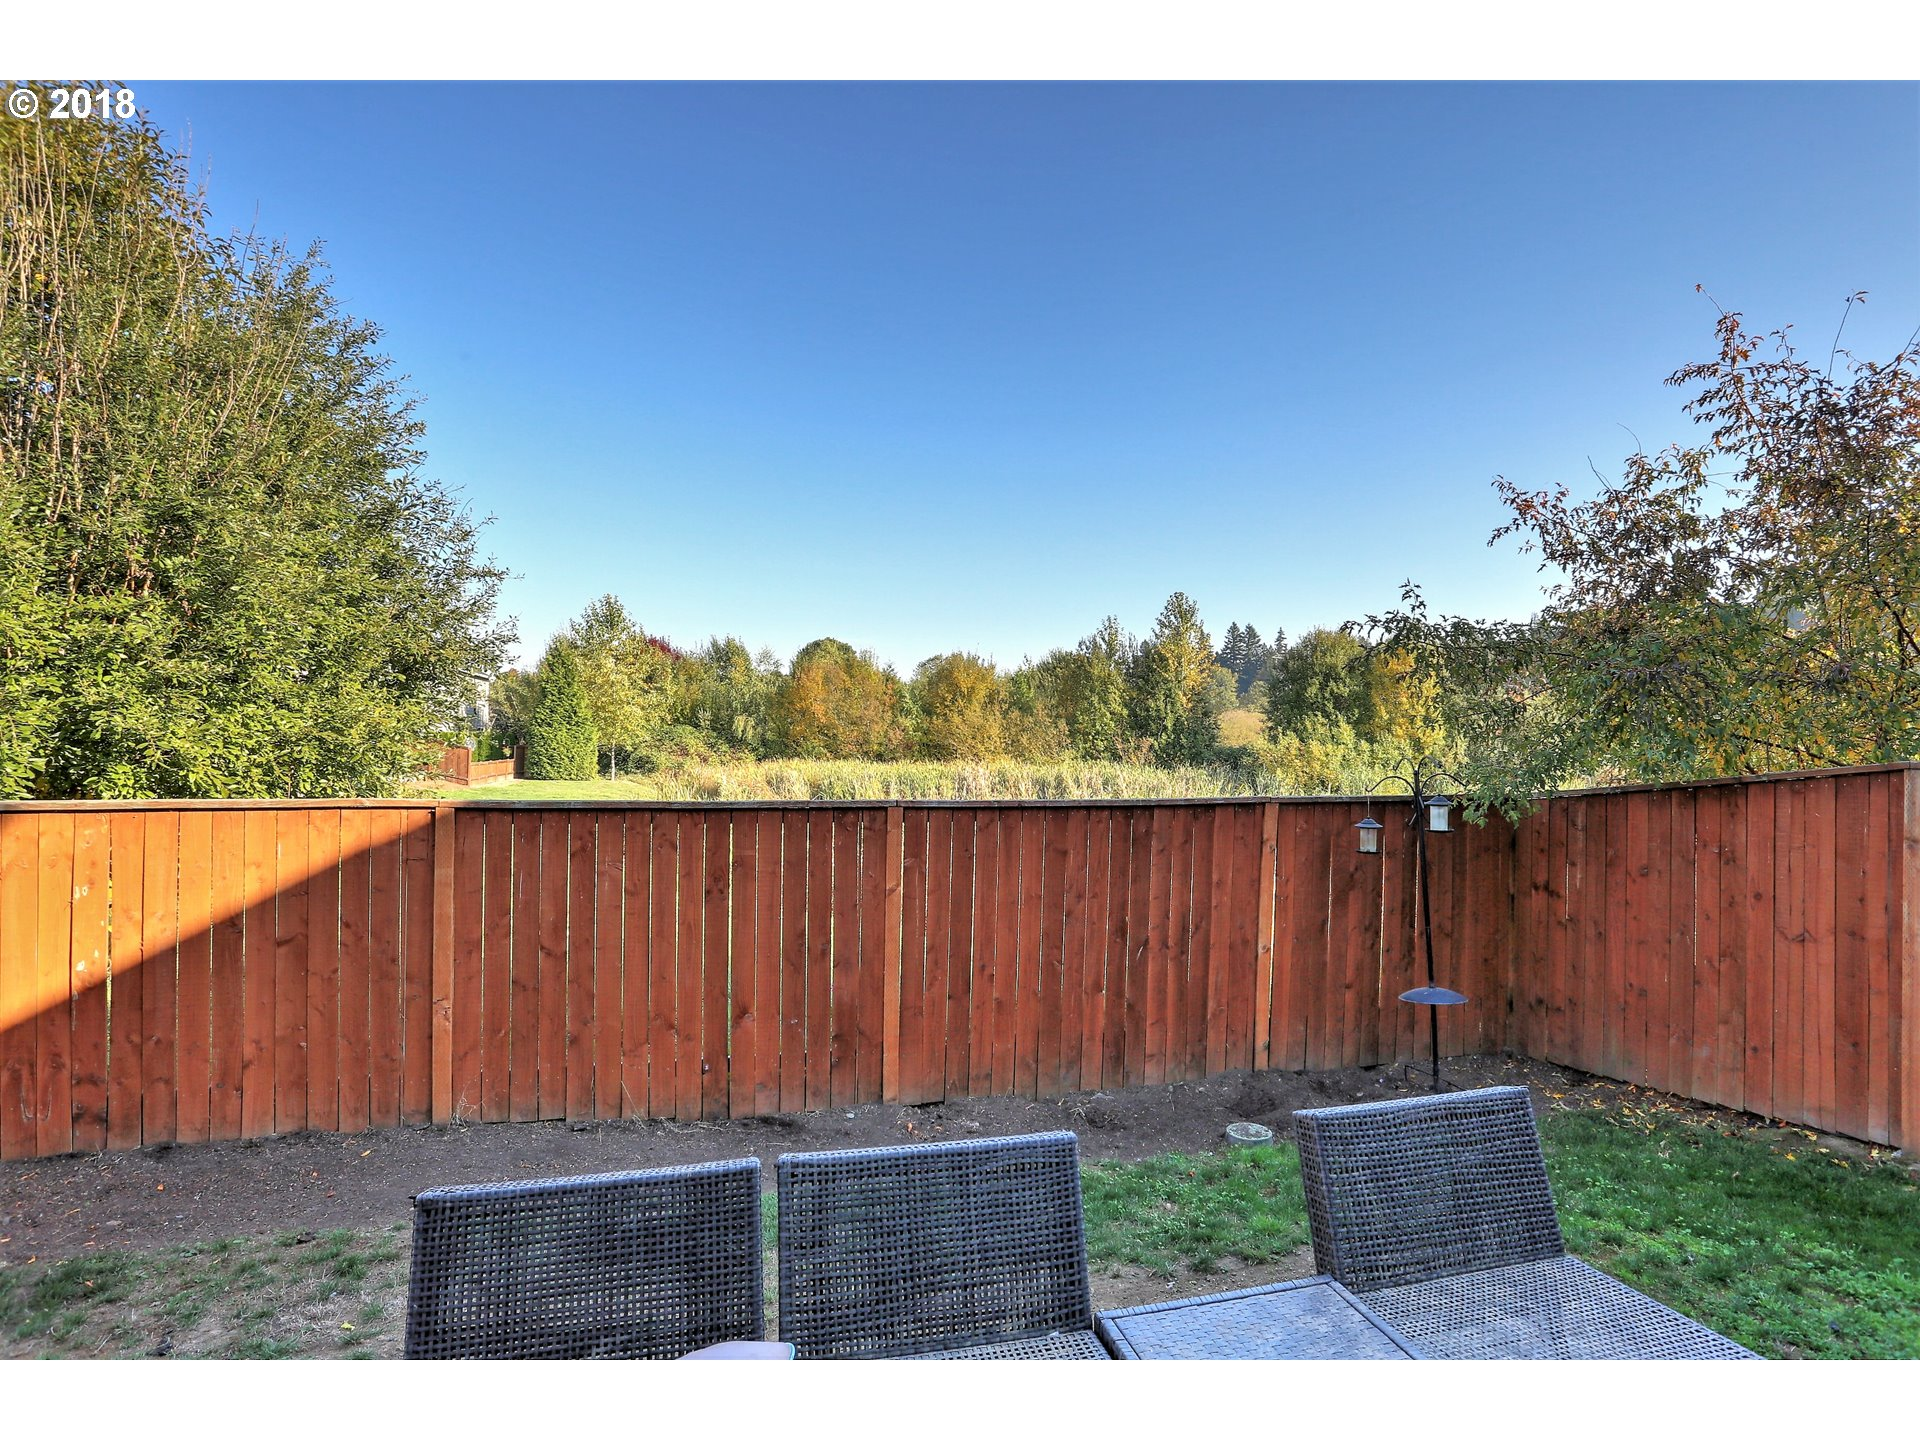 7925 NE 19TH CIR Vancouver, WA 98664 - MLS #: 18664860